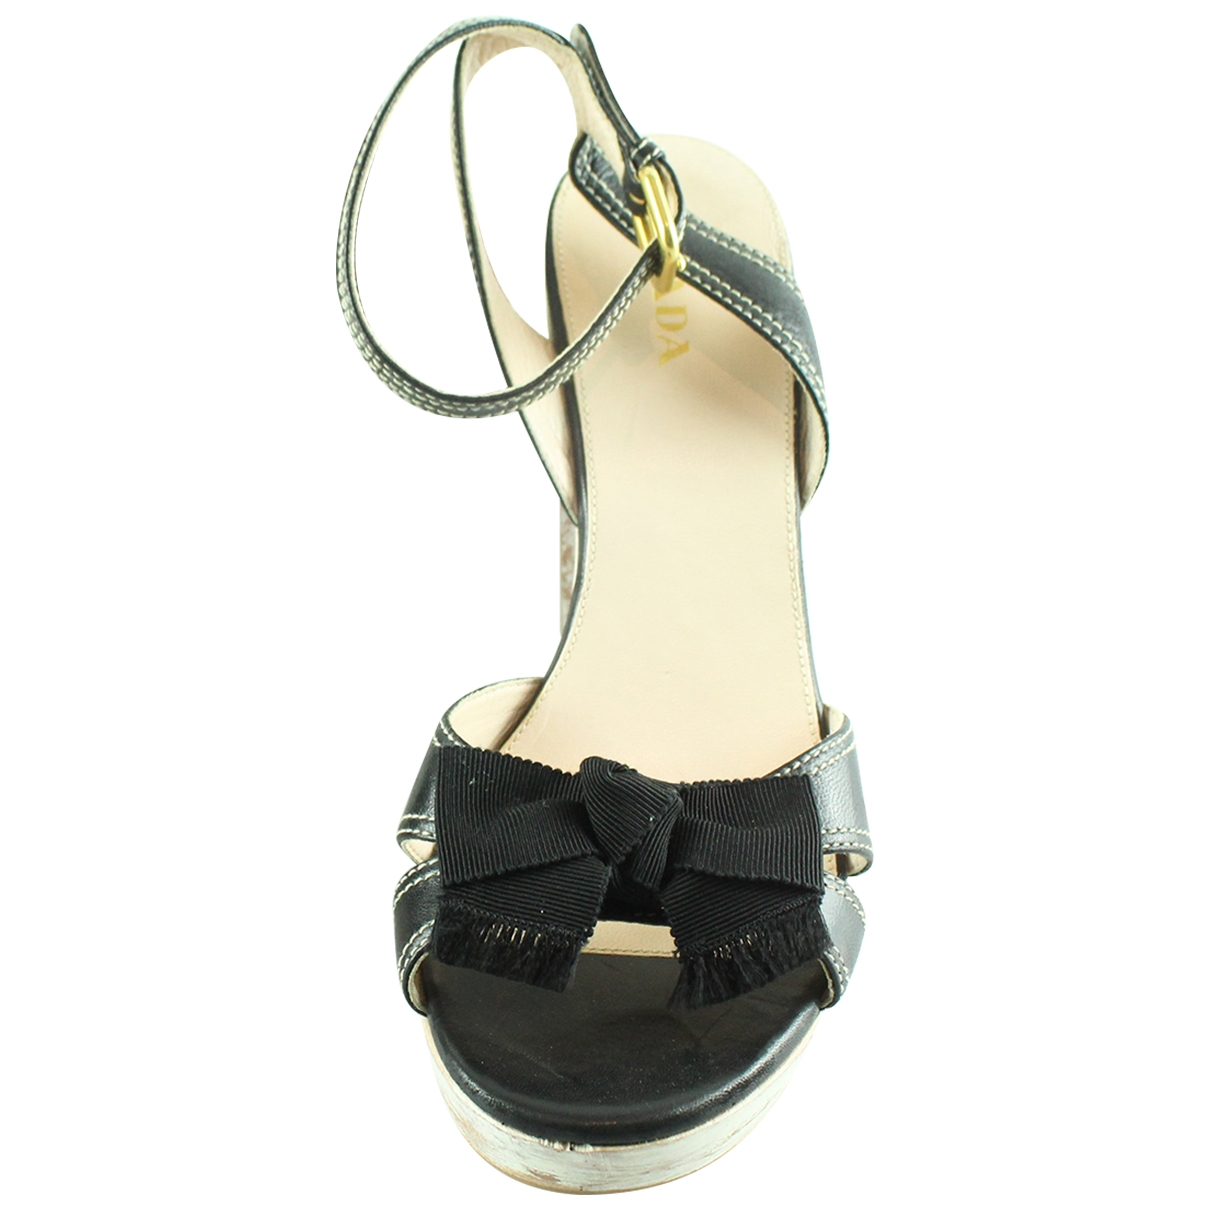 Prada \N Black Patent leather Sandals for Women 41 EU